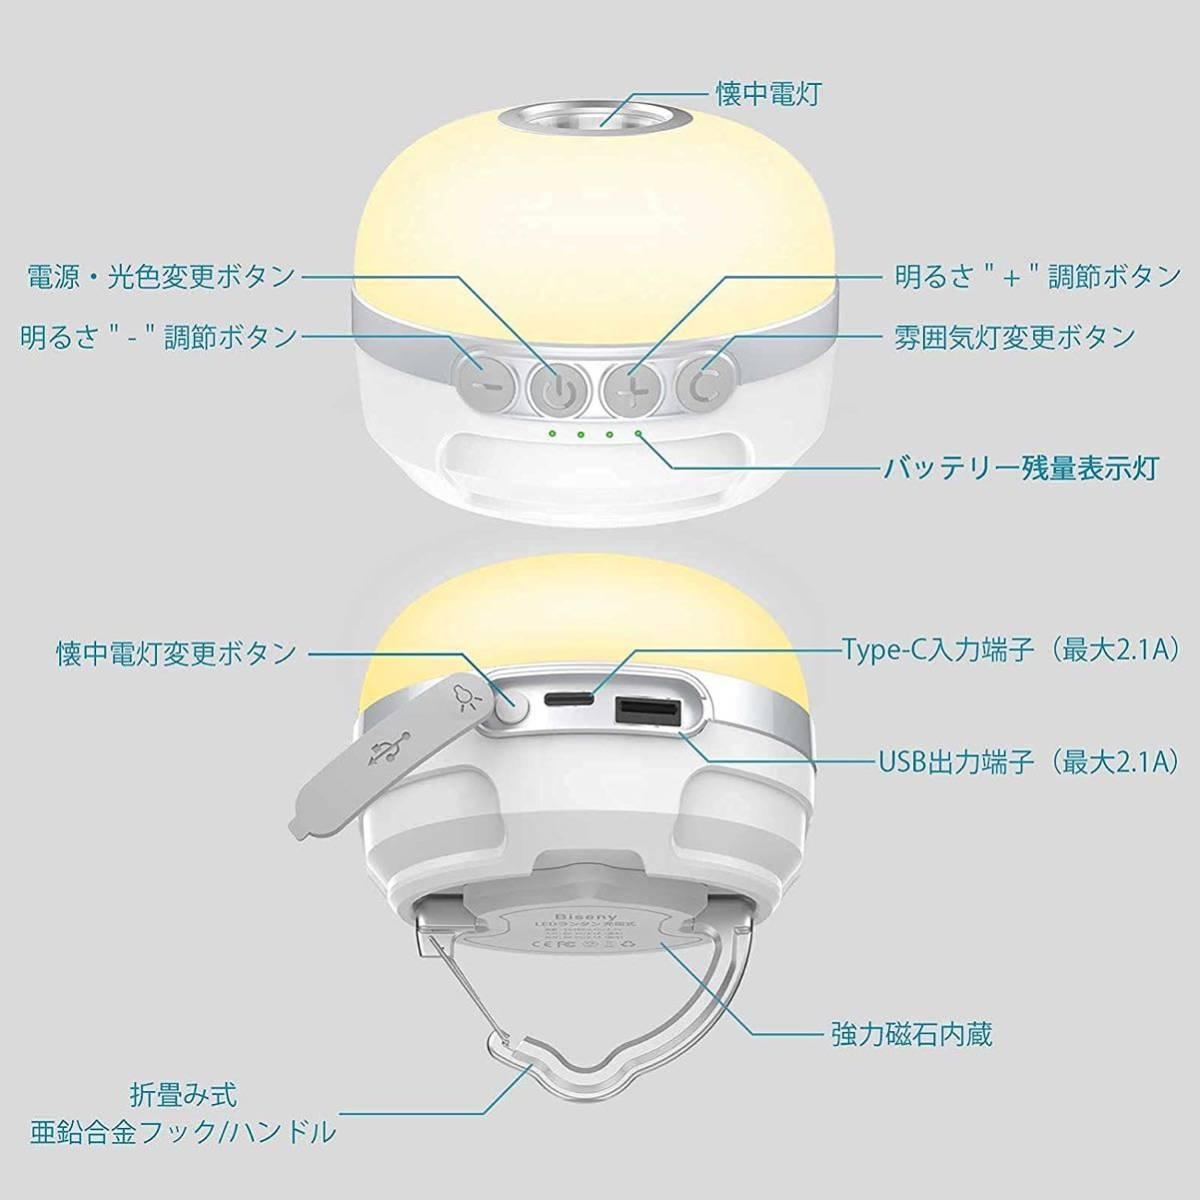 LEDランタン 防水 無段階調光 四色切替+RGB雰囲気灯 充電式 強力磁石